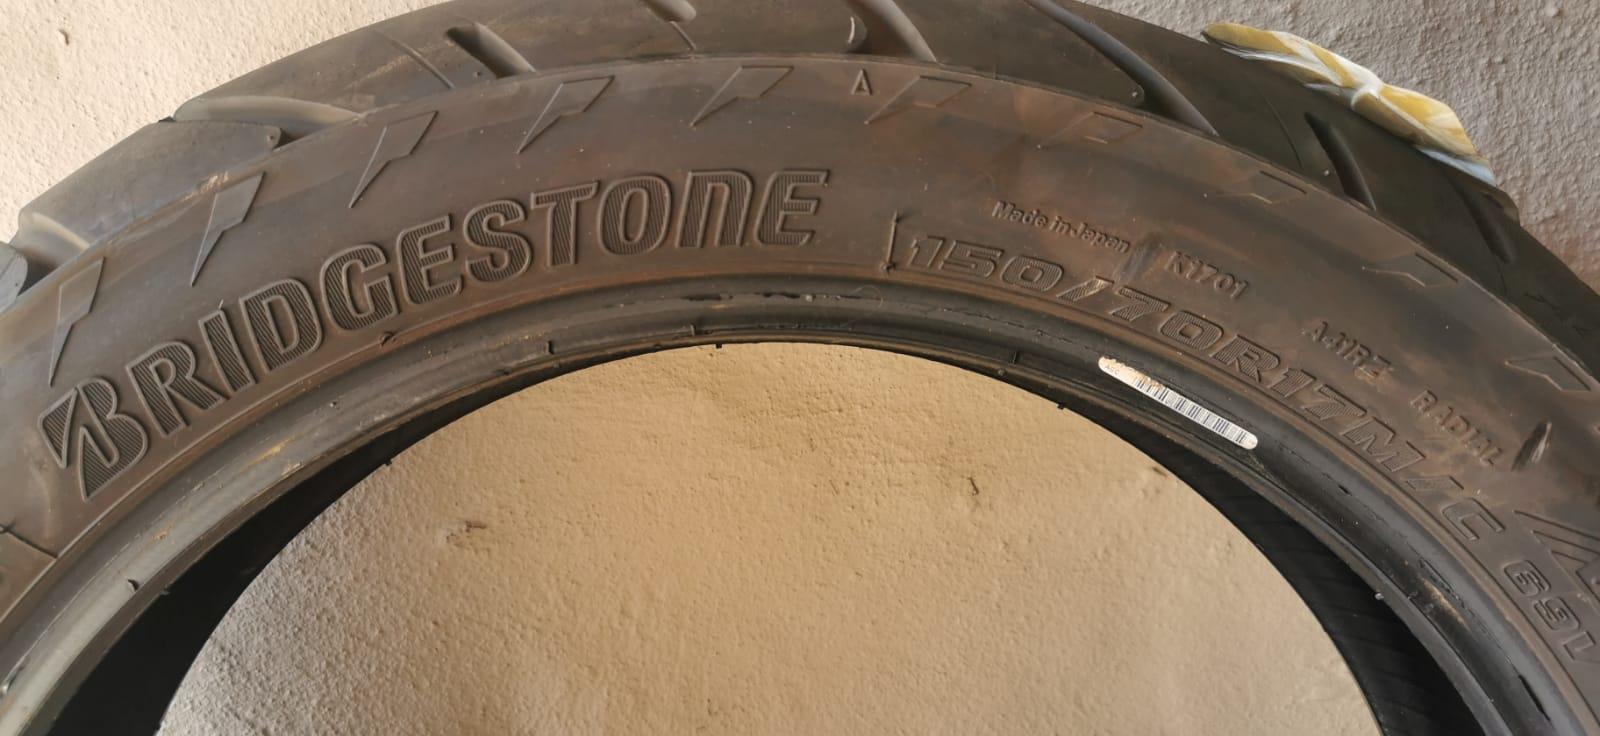 Bridgestone Bike tires for sale